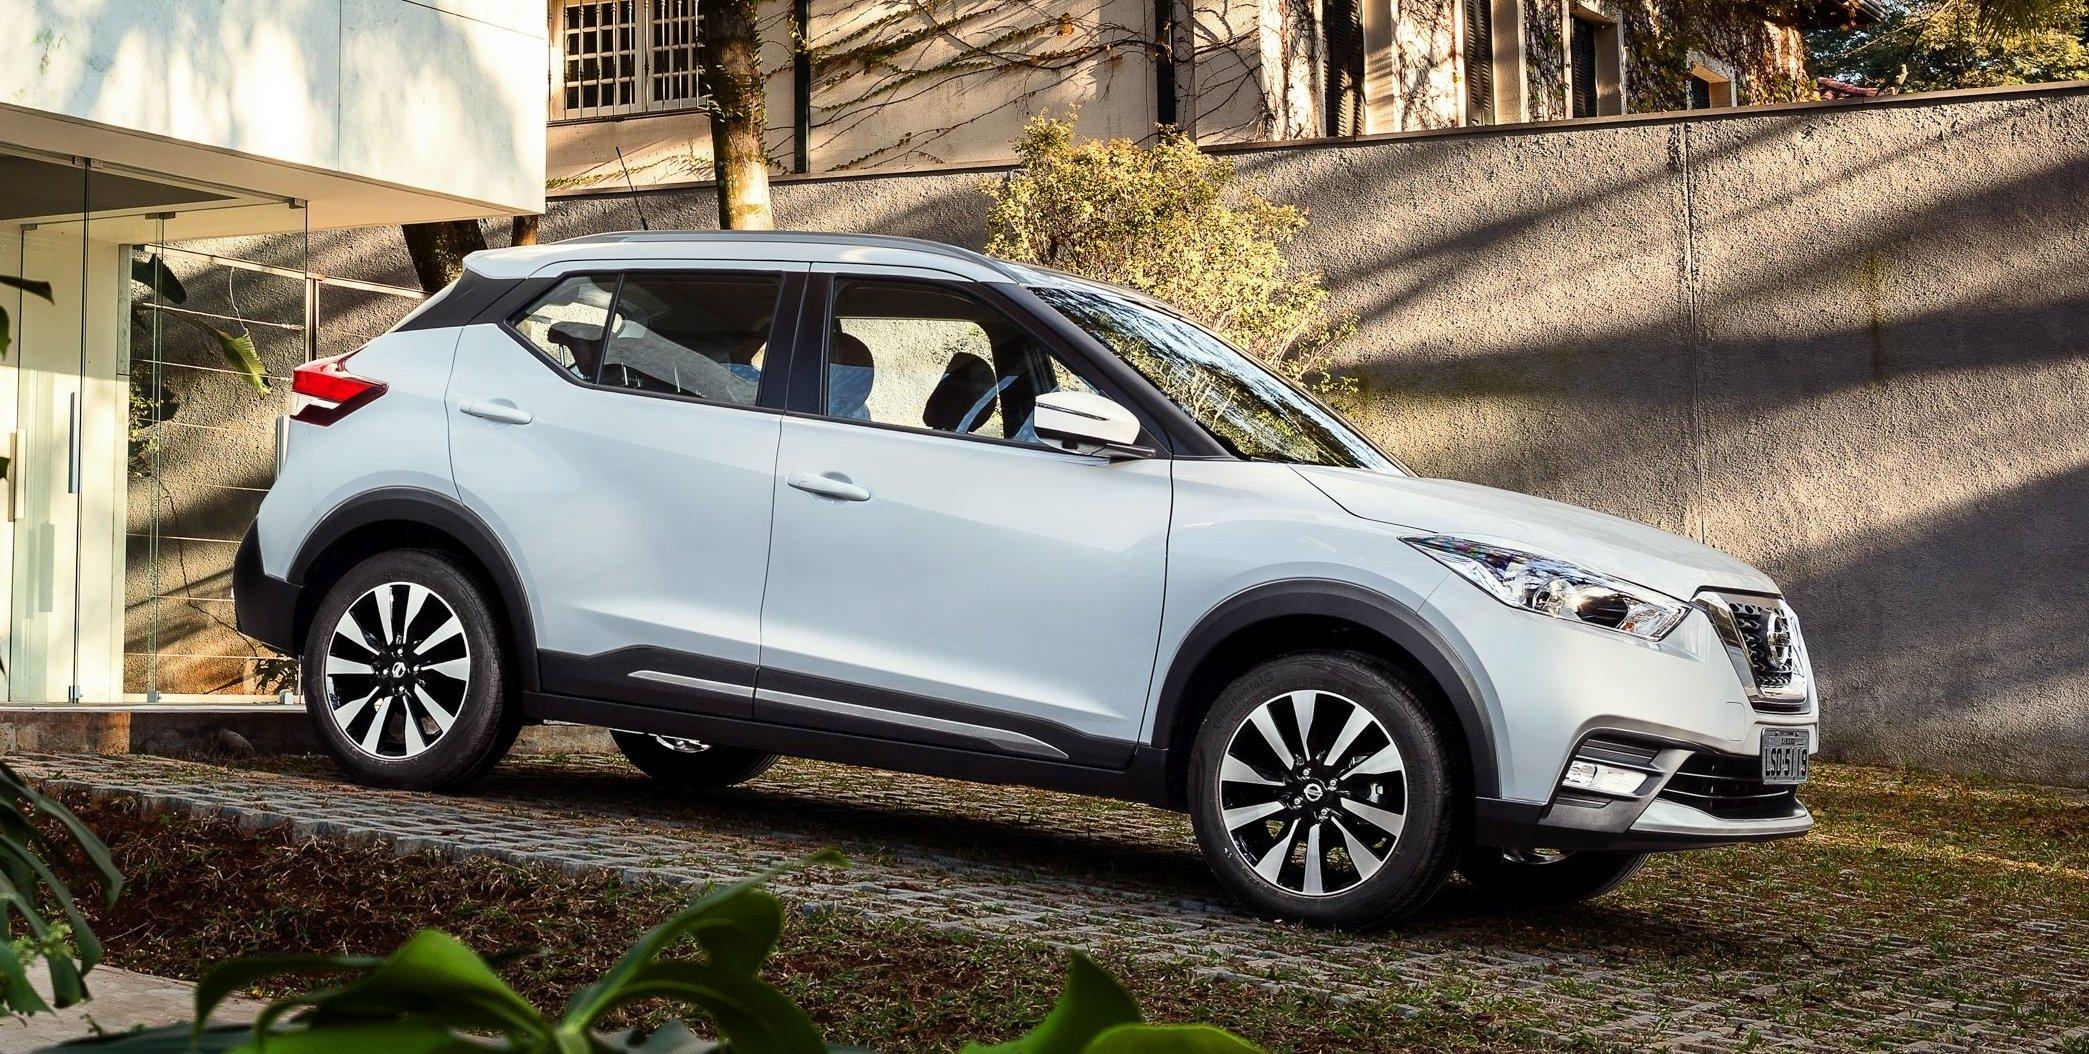 Honda Hr V 2017 >> Honda HR-V的对手来了,Nissan Kicks正式在巴西上市! Nissan Kicks 2017 - Paul Tan 汽车资讯网